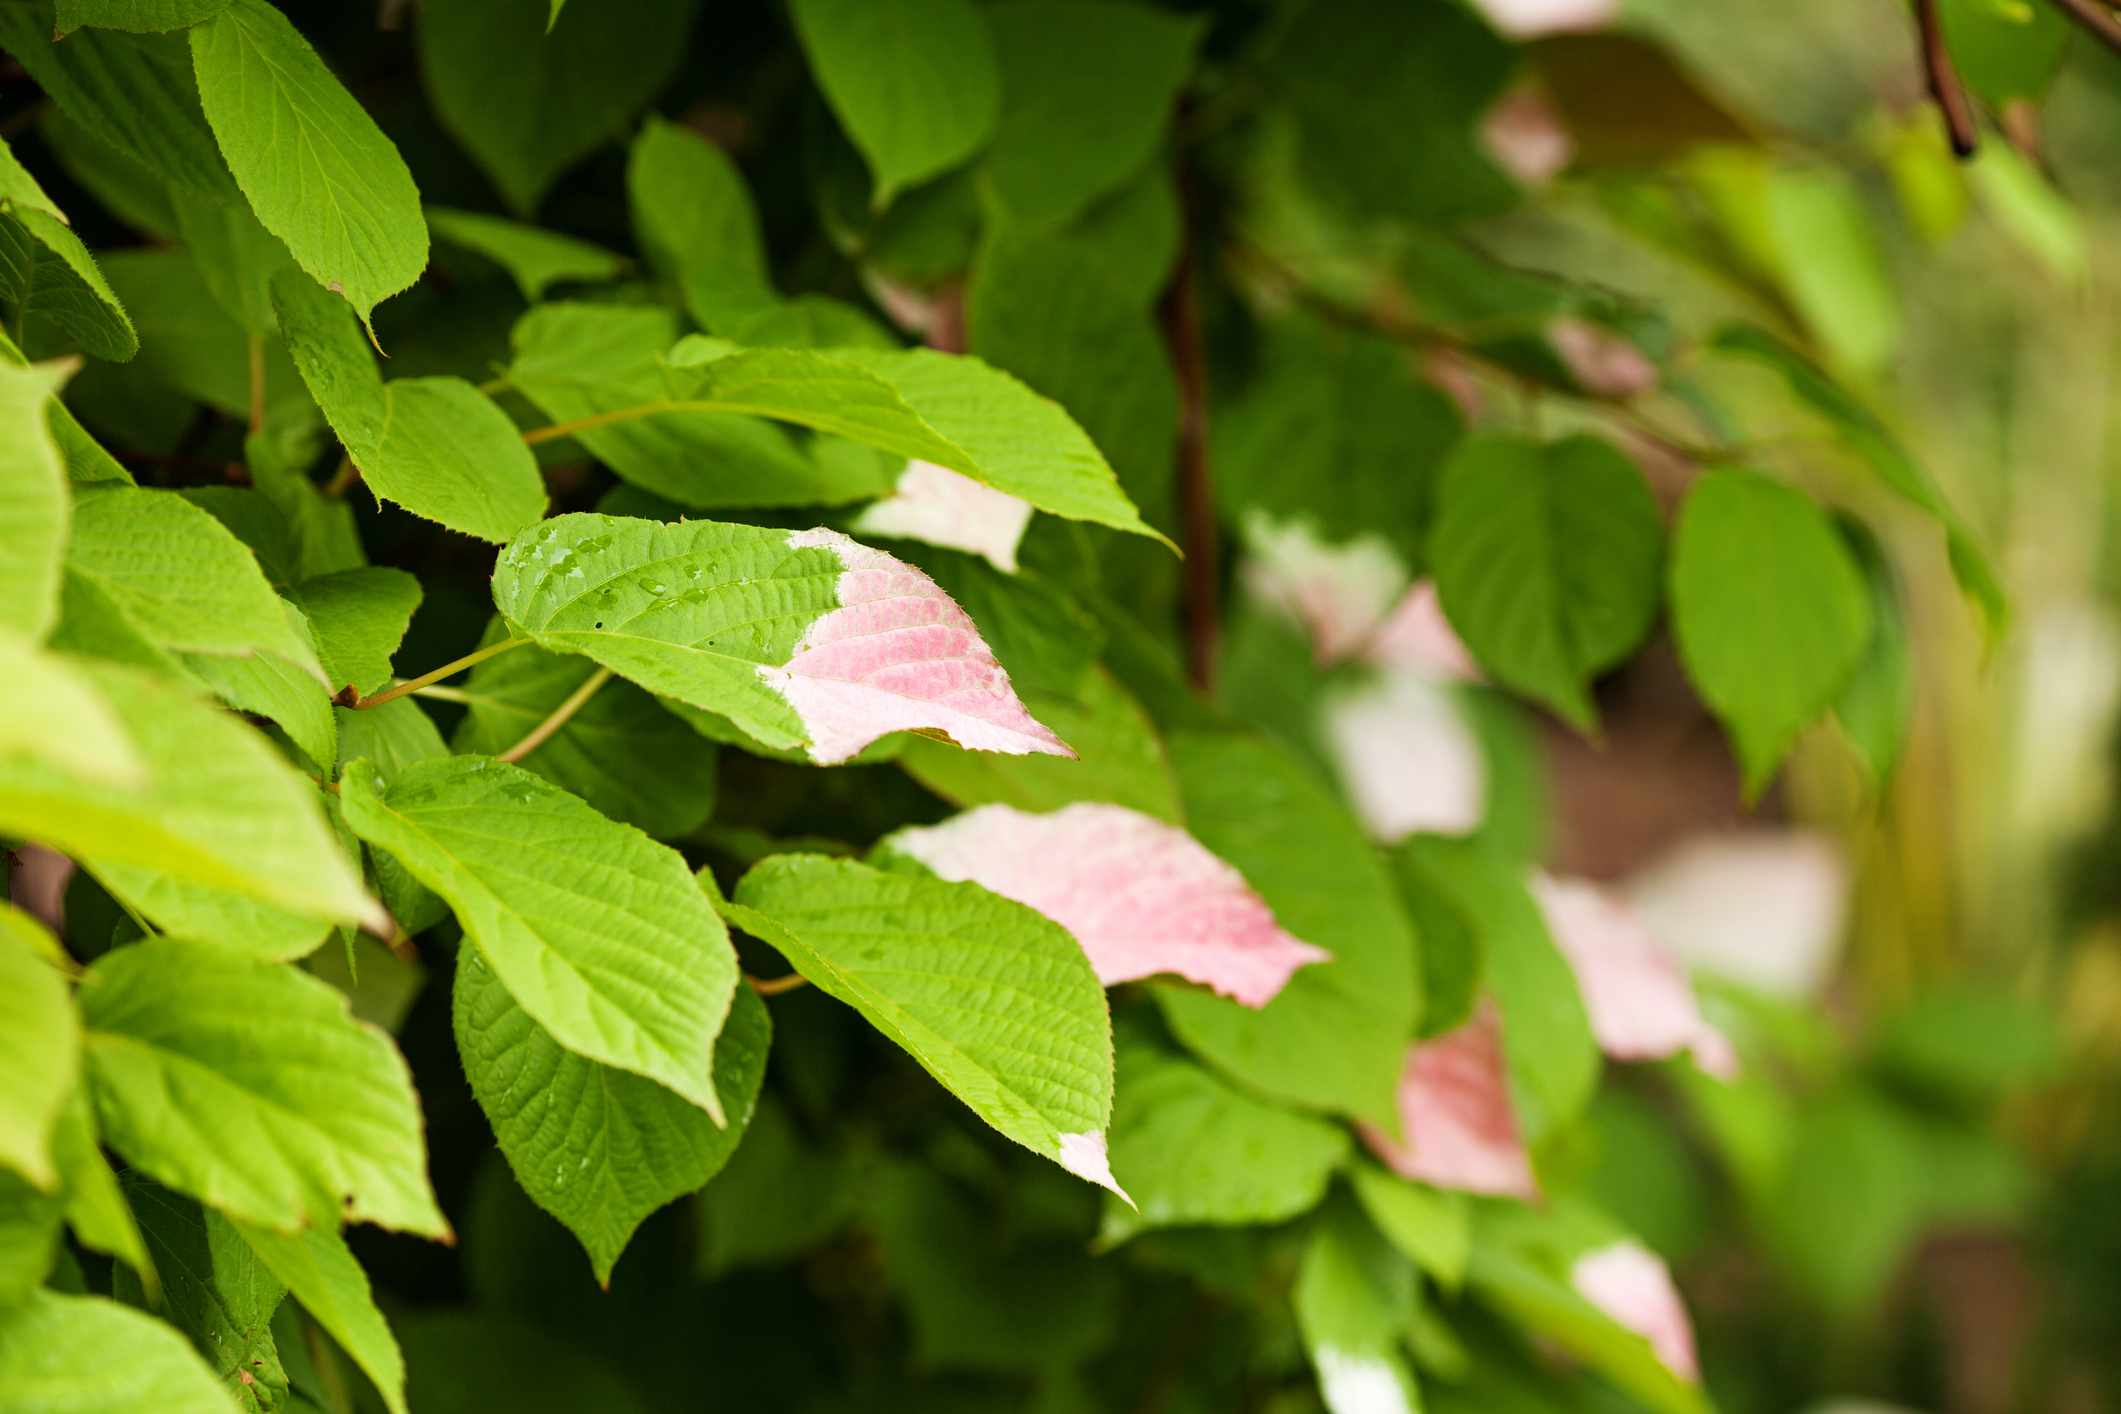 Half colored, white and pink green leaves of Variegated Kiwi Vine, Kolomikta Vine, Arctic Beauty Kiwi, Kolomikta Kiwi, Schmuckkiwi, Strahlengriffel (Actinidia kolomikta).